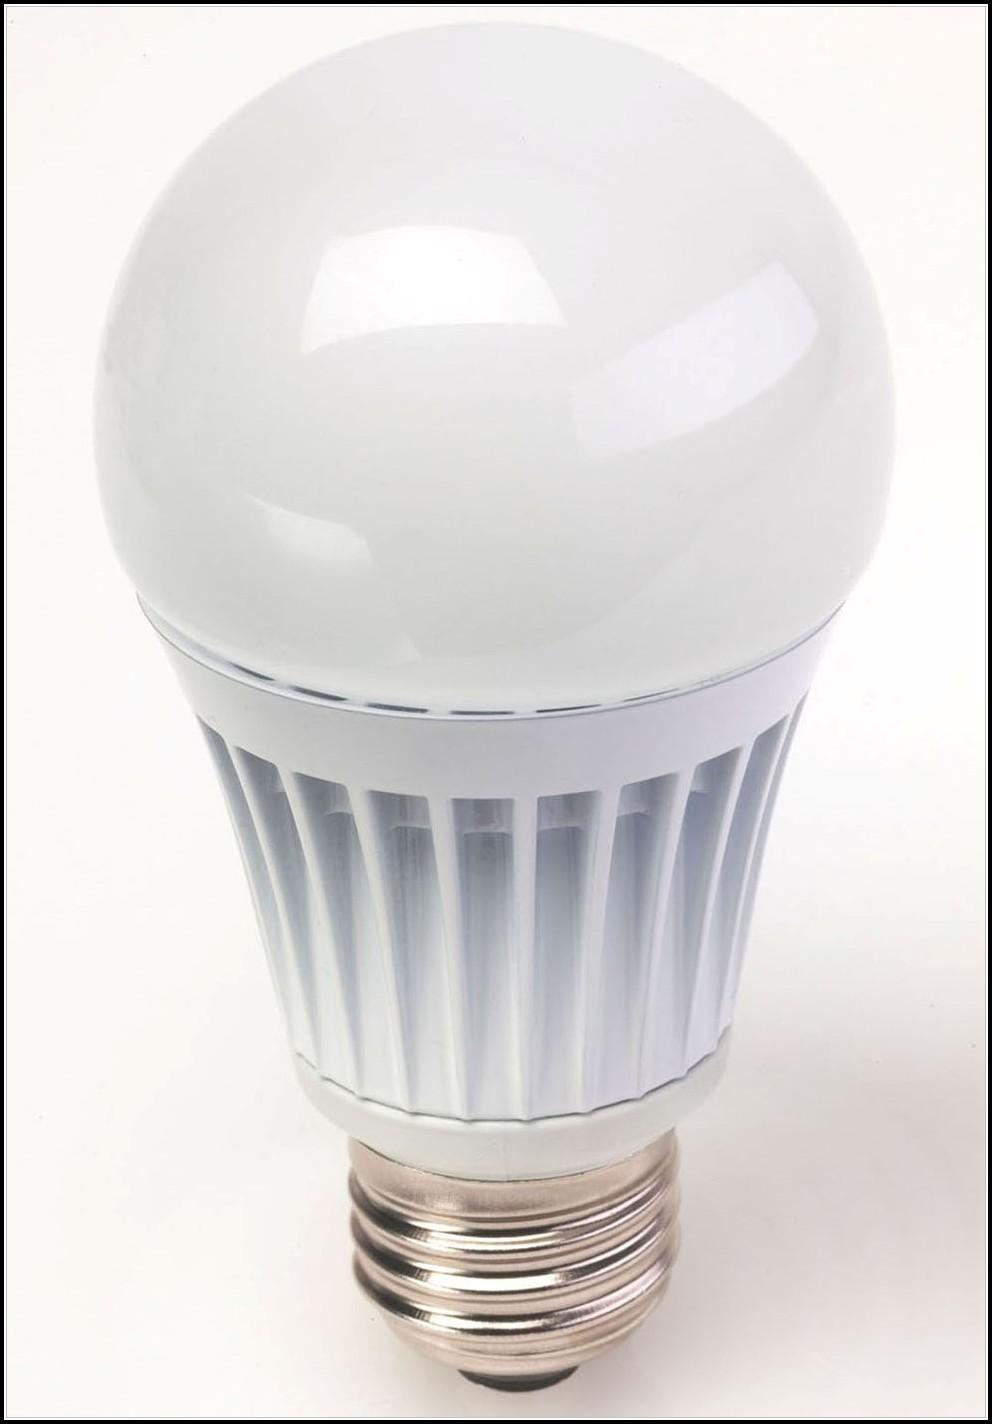 Led Lamps Home Depot